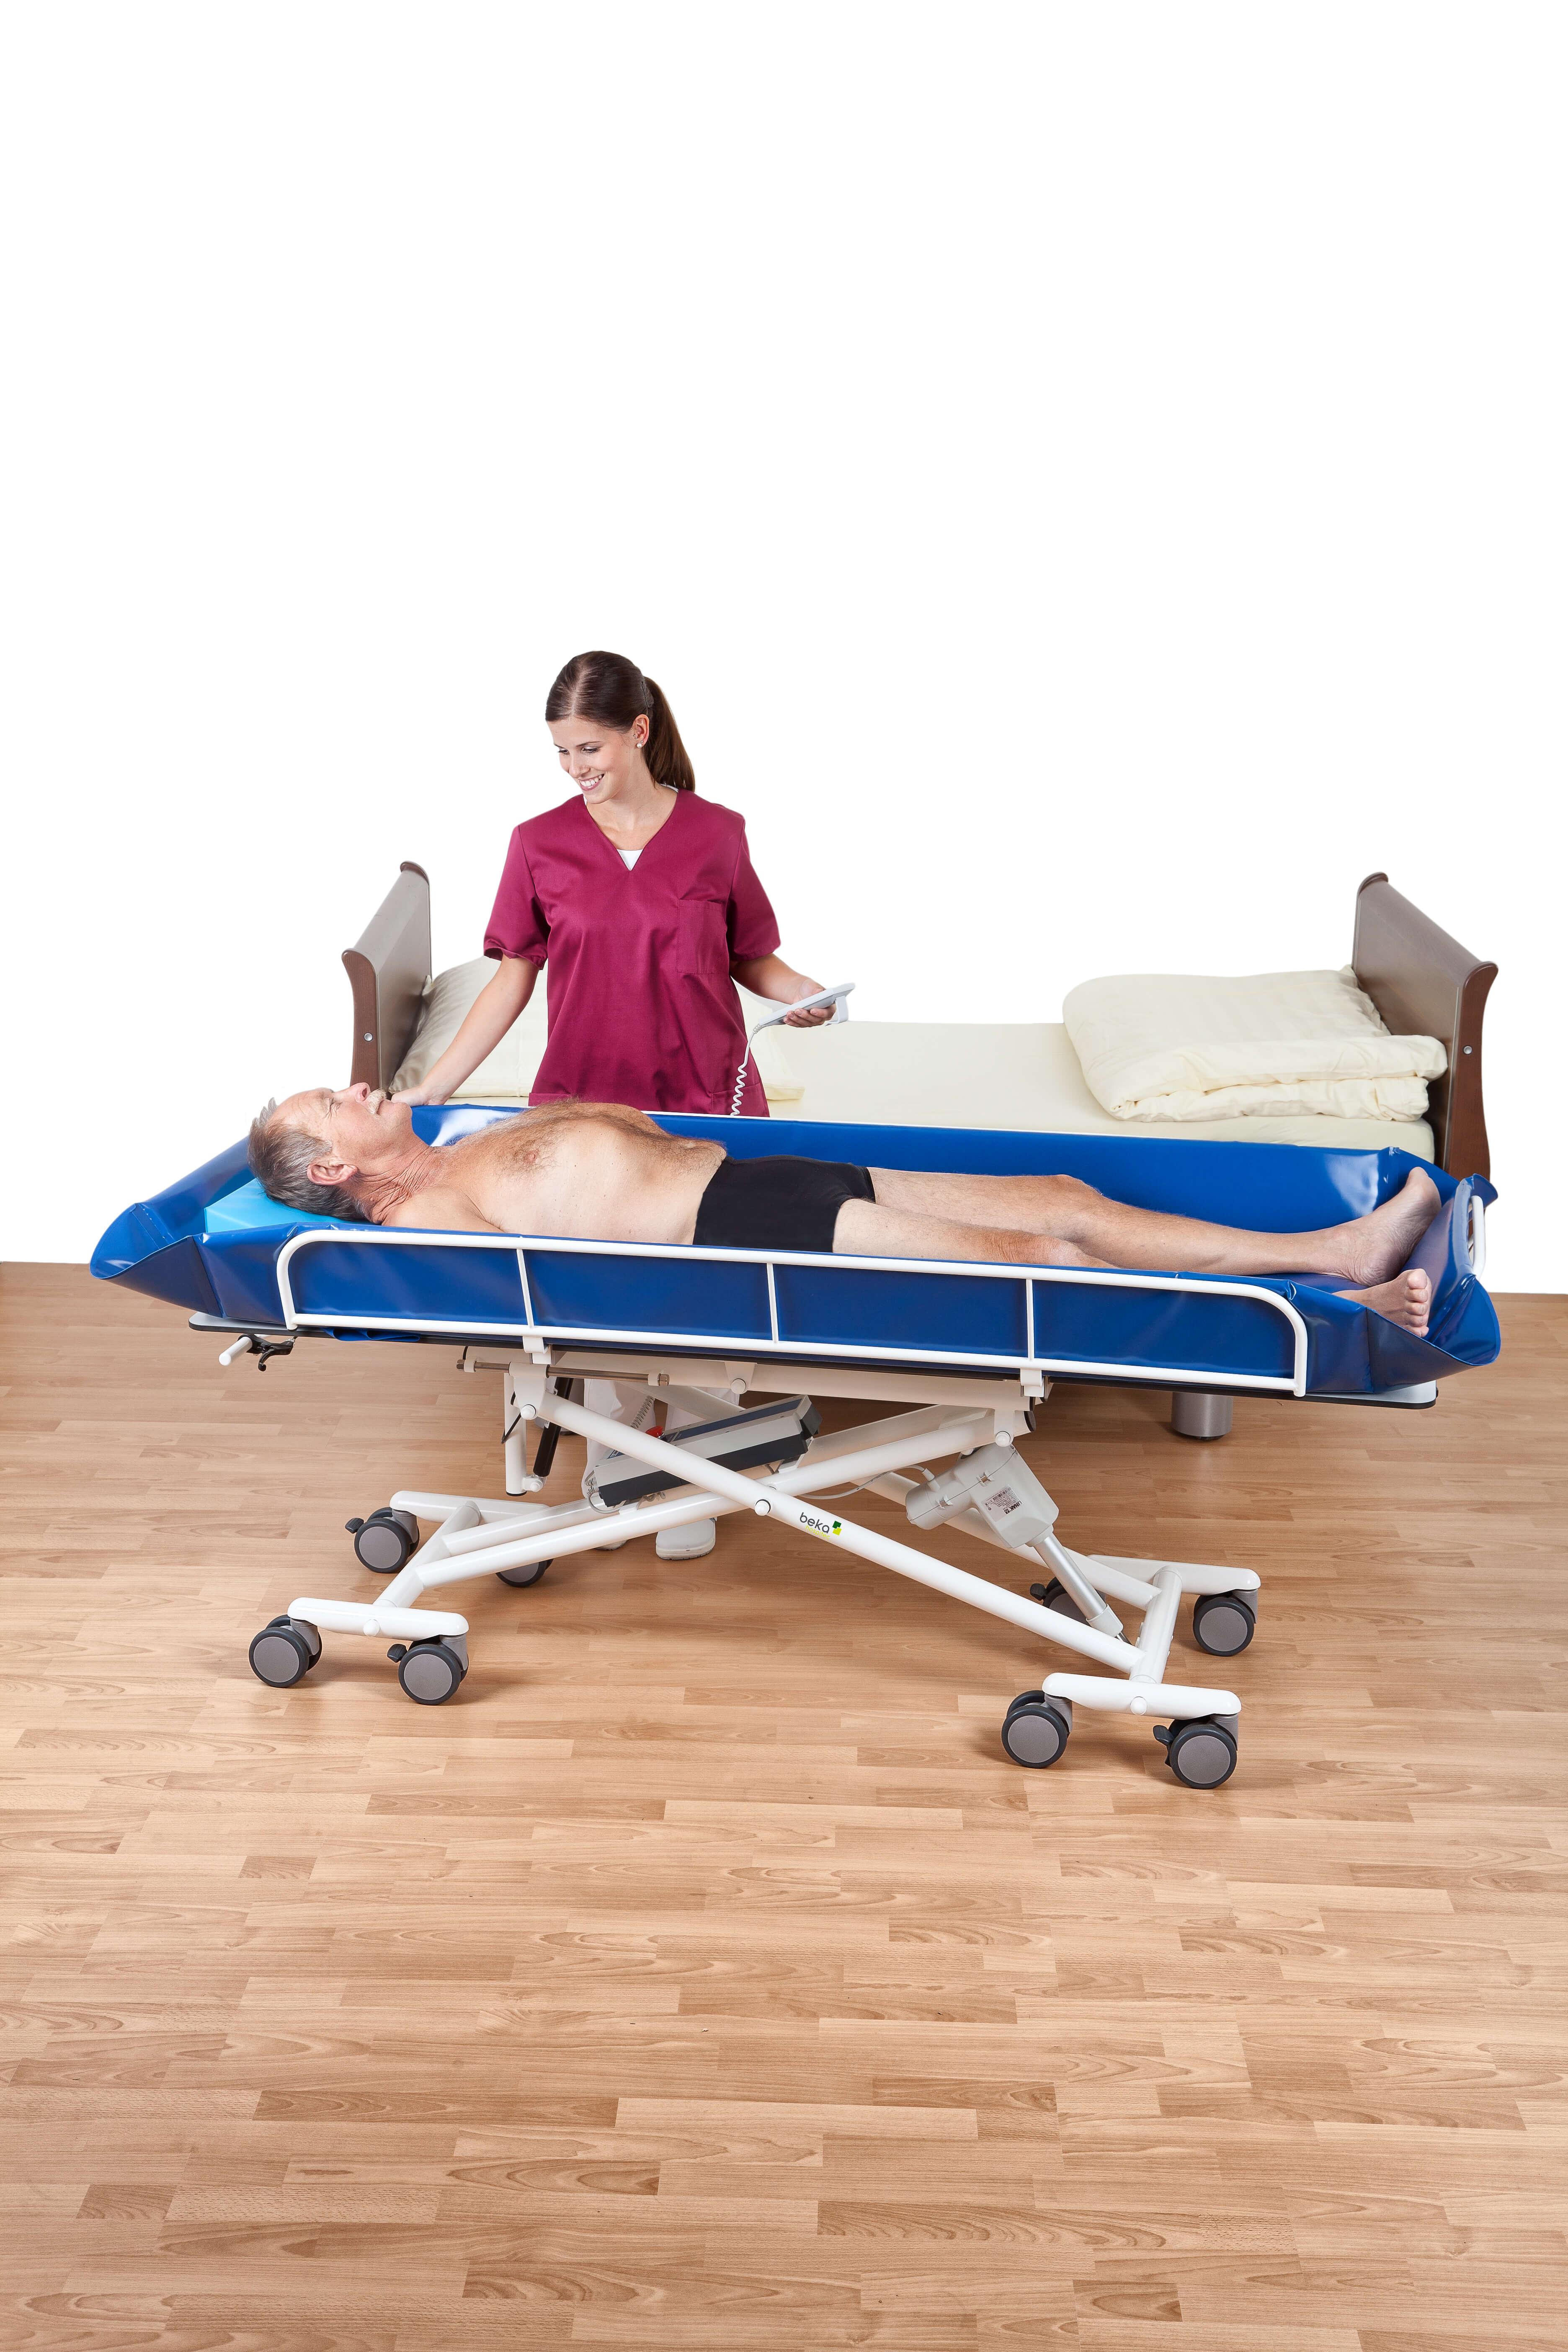 nursing equipment shower trolley electric medical gif lm t furniture